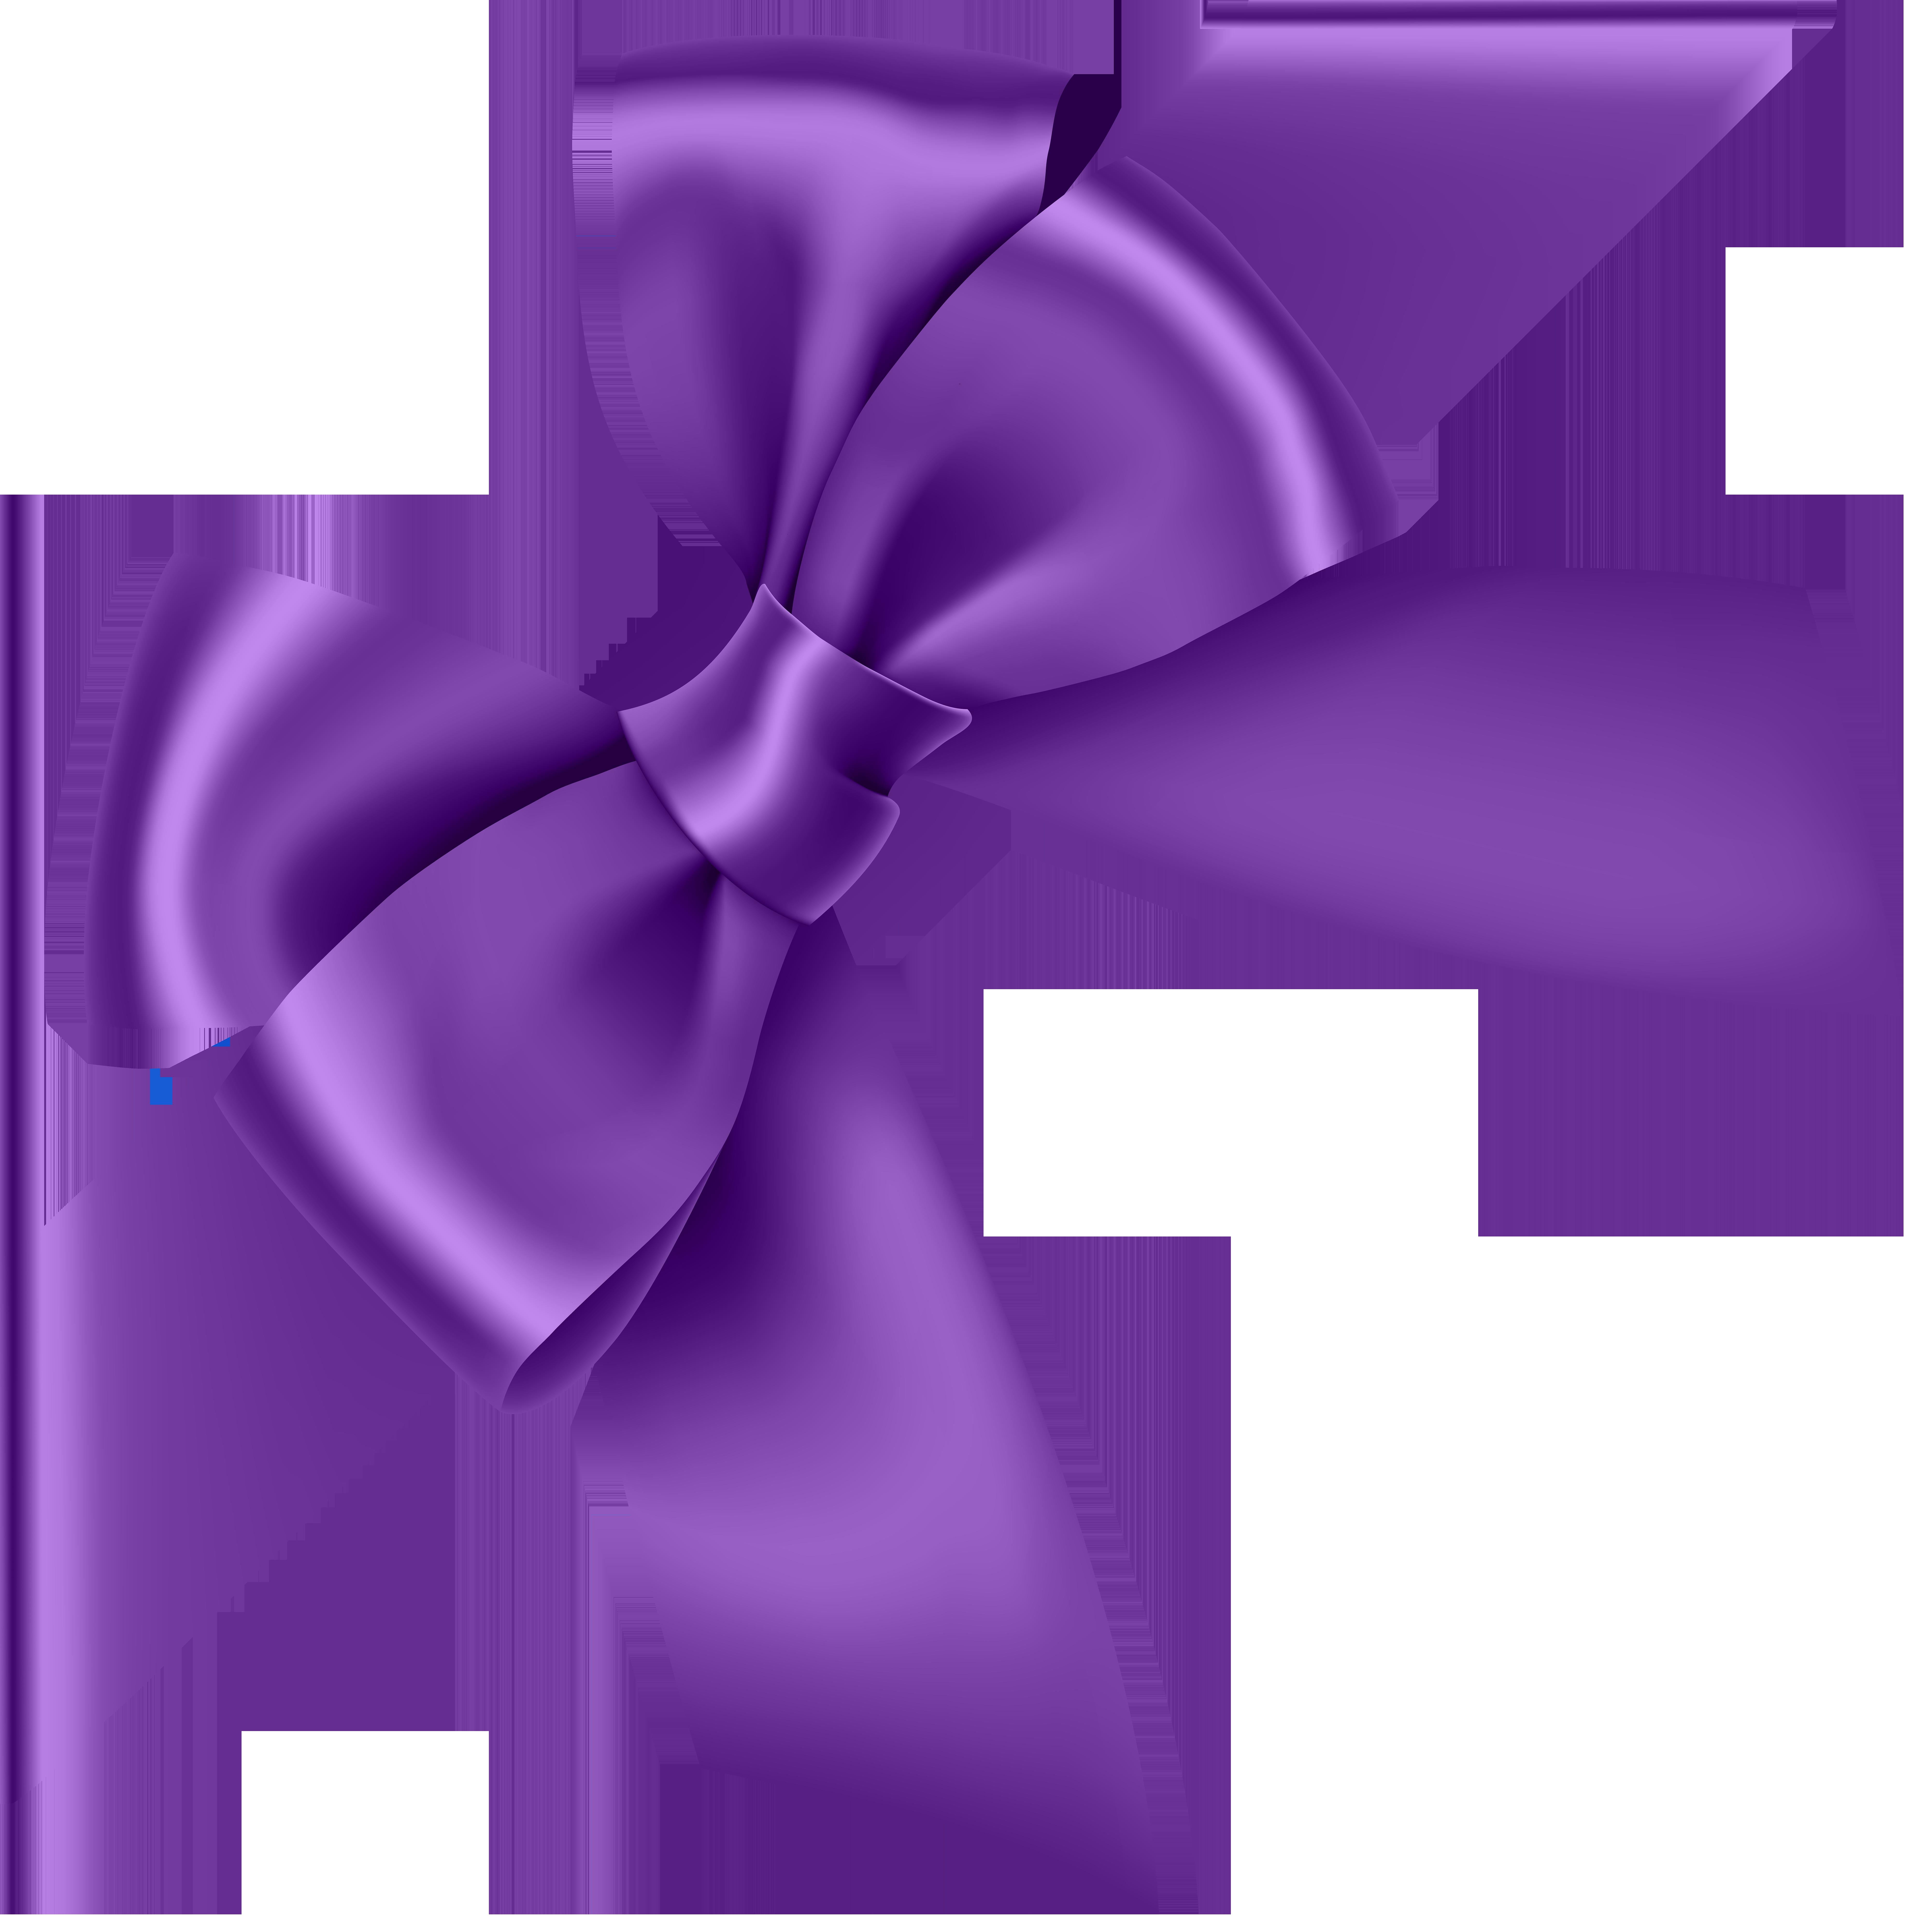 Purple Corner Bow Transparent Clip Art Image